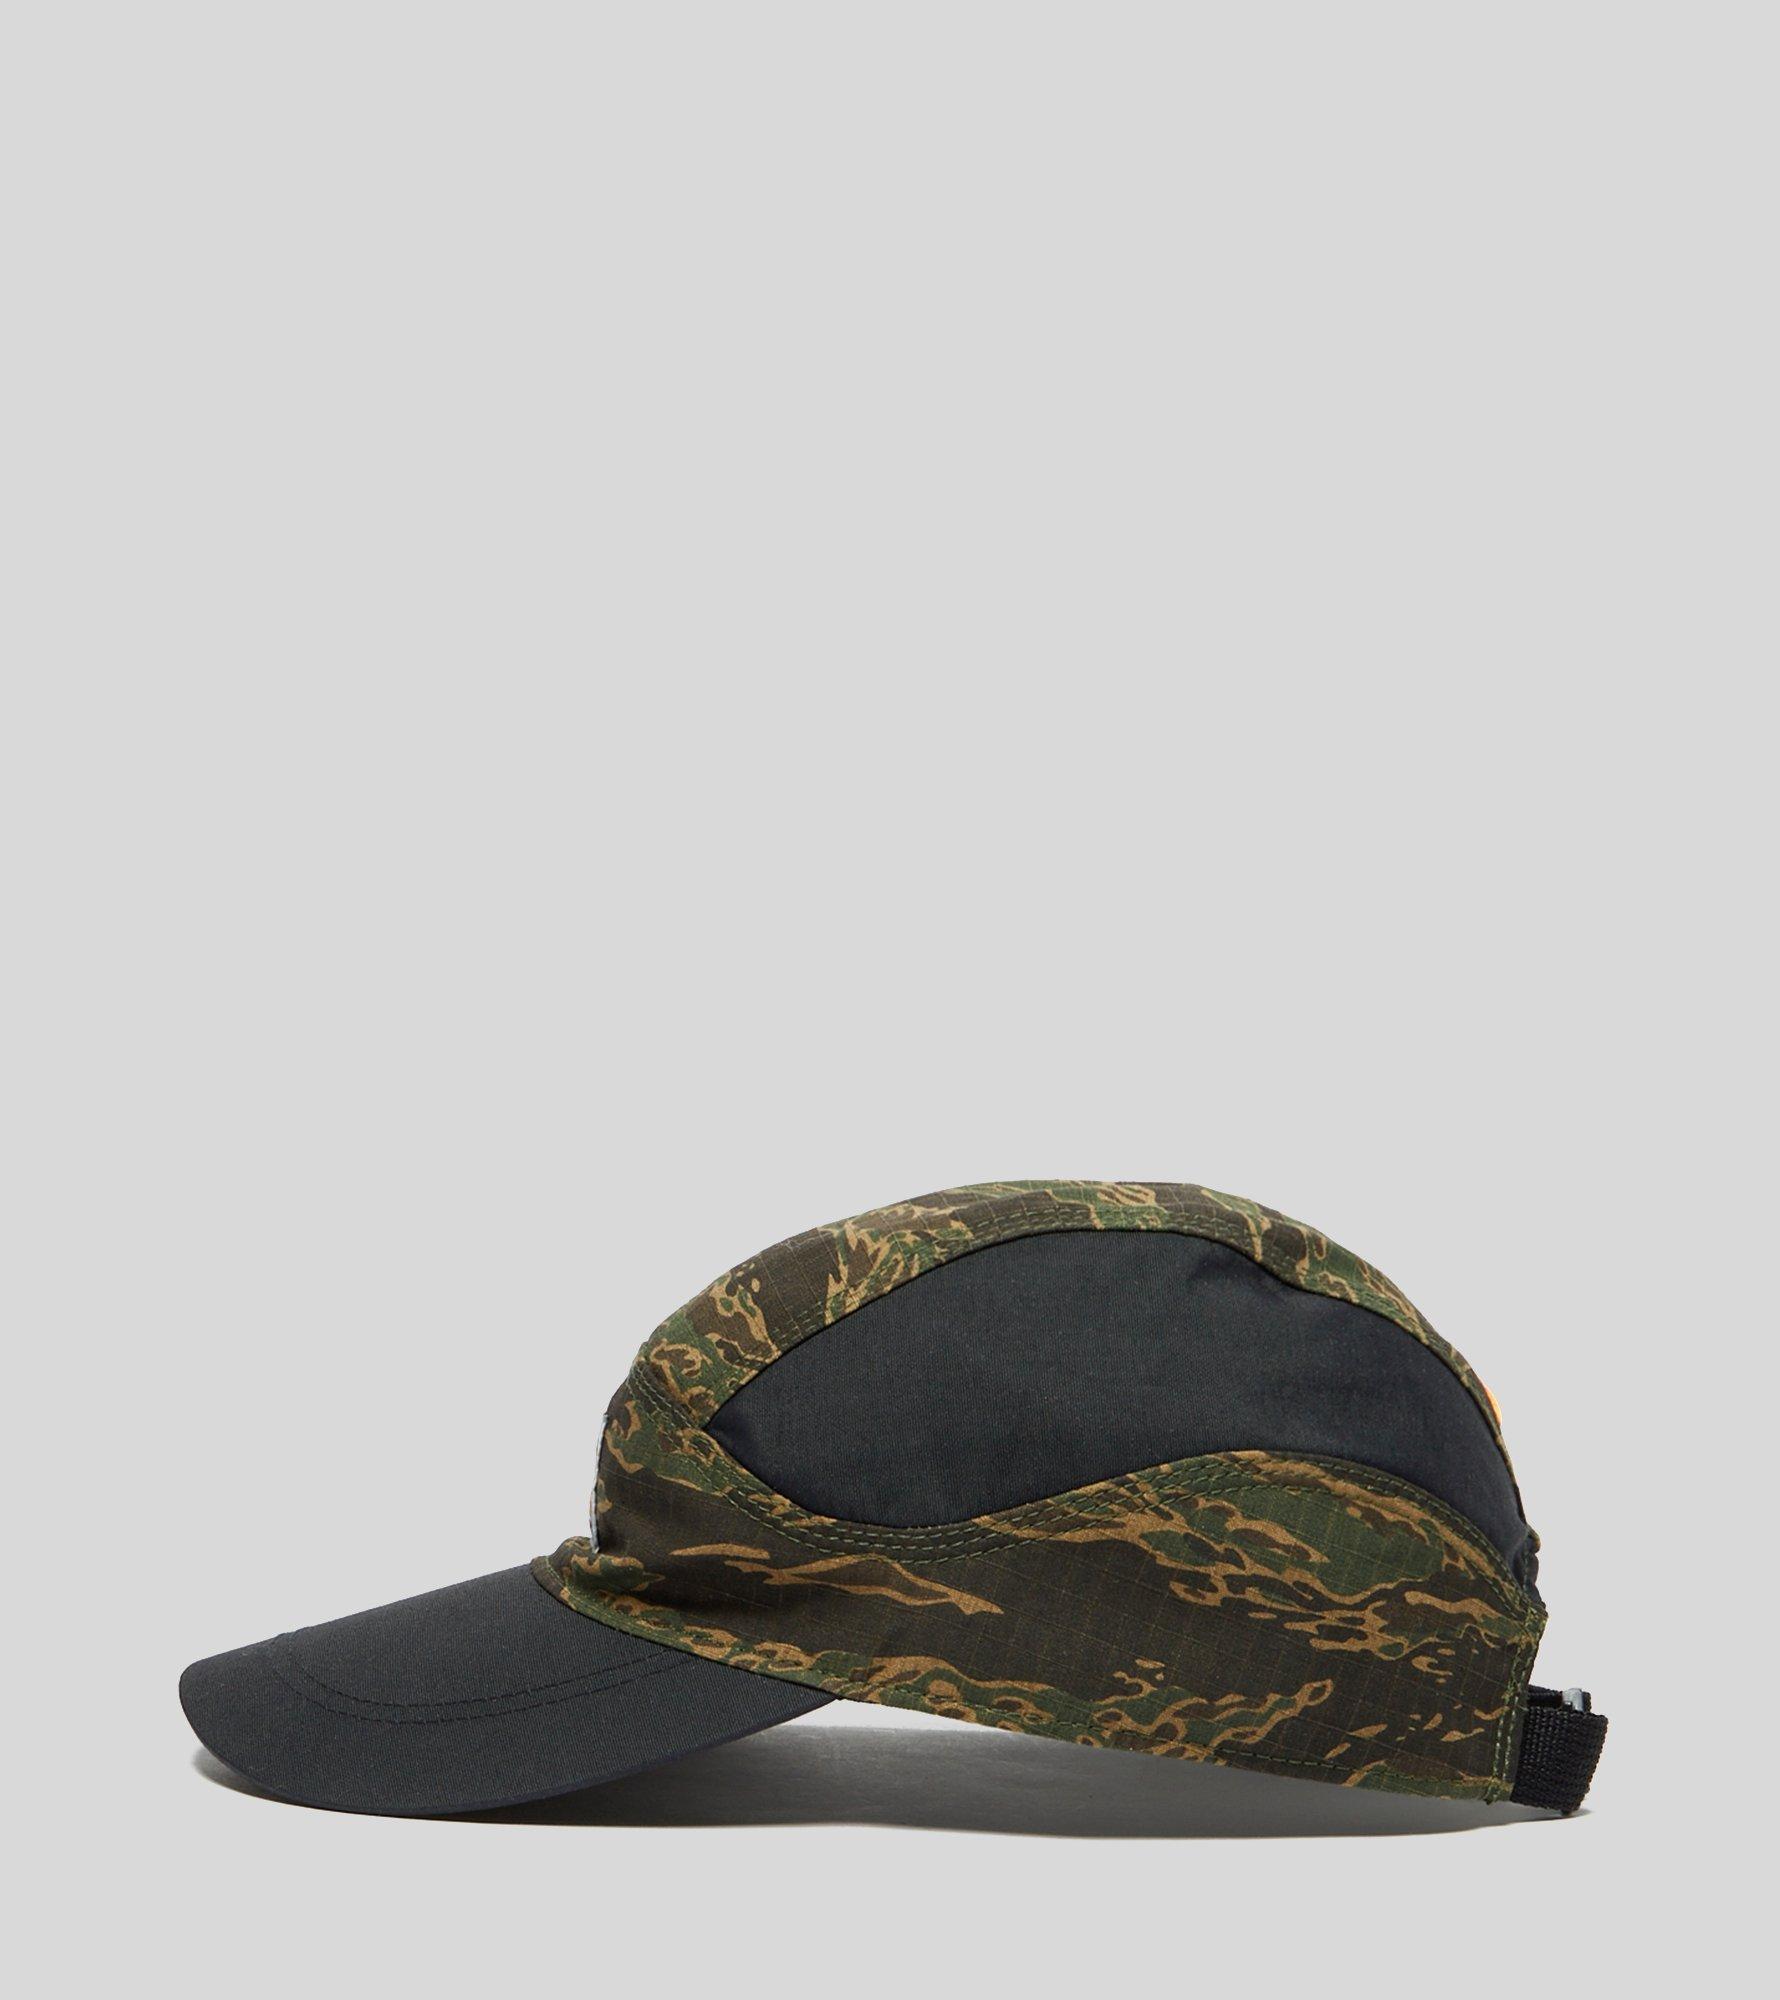 eac0419e4fab1 Nike X Carhartt Wip Nrg Tailwind Cap in Black for Men - Lyst